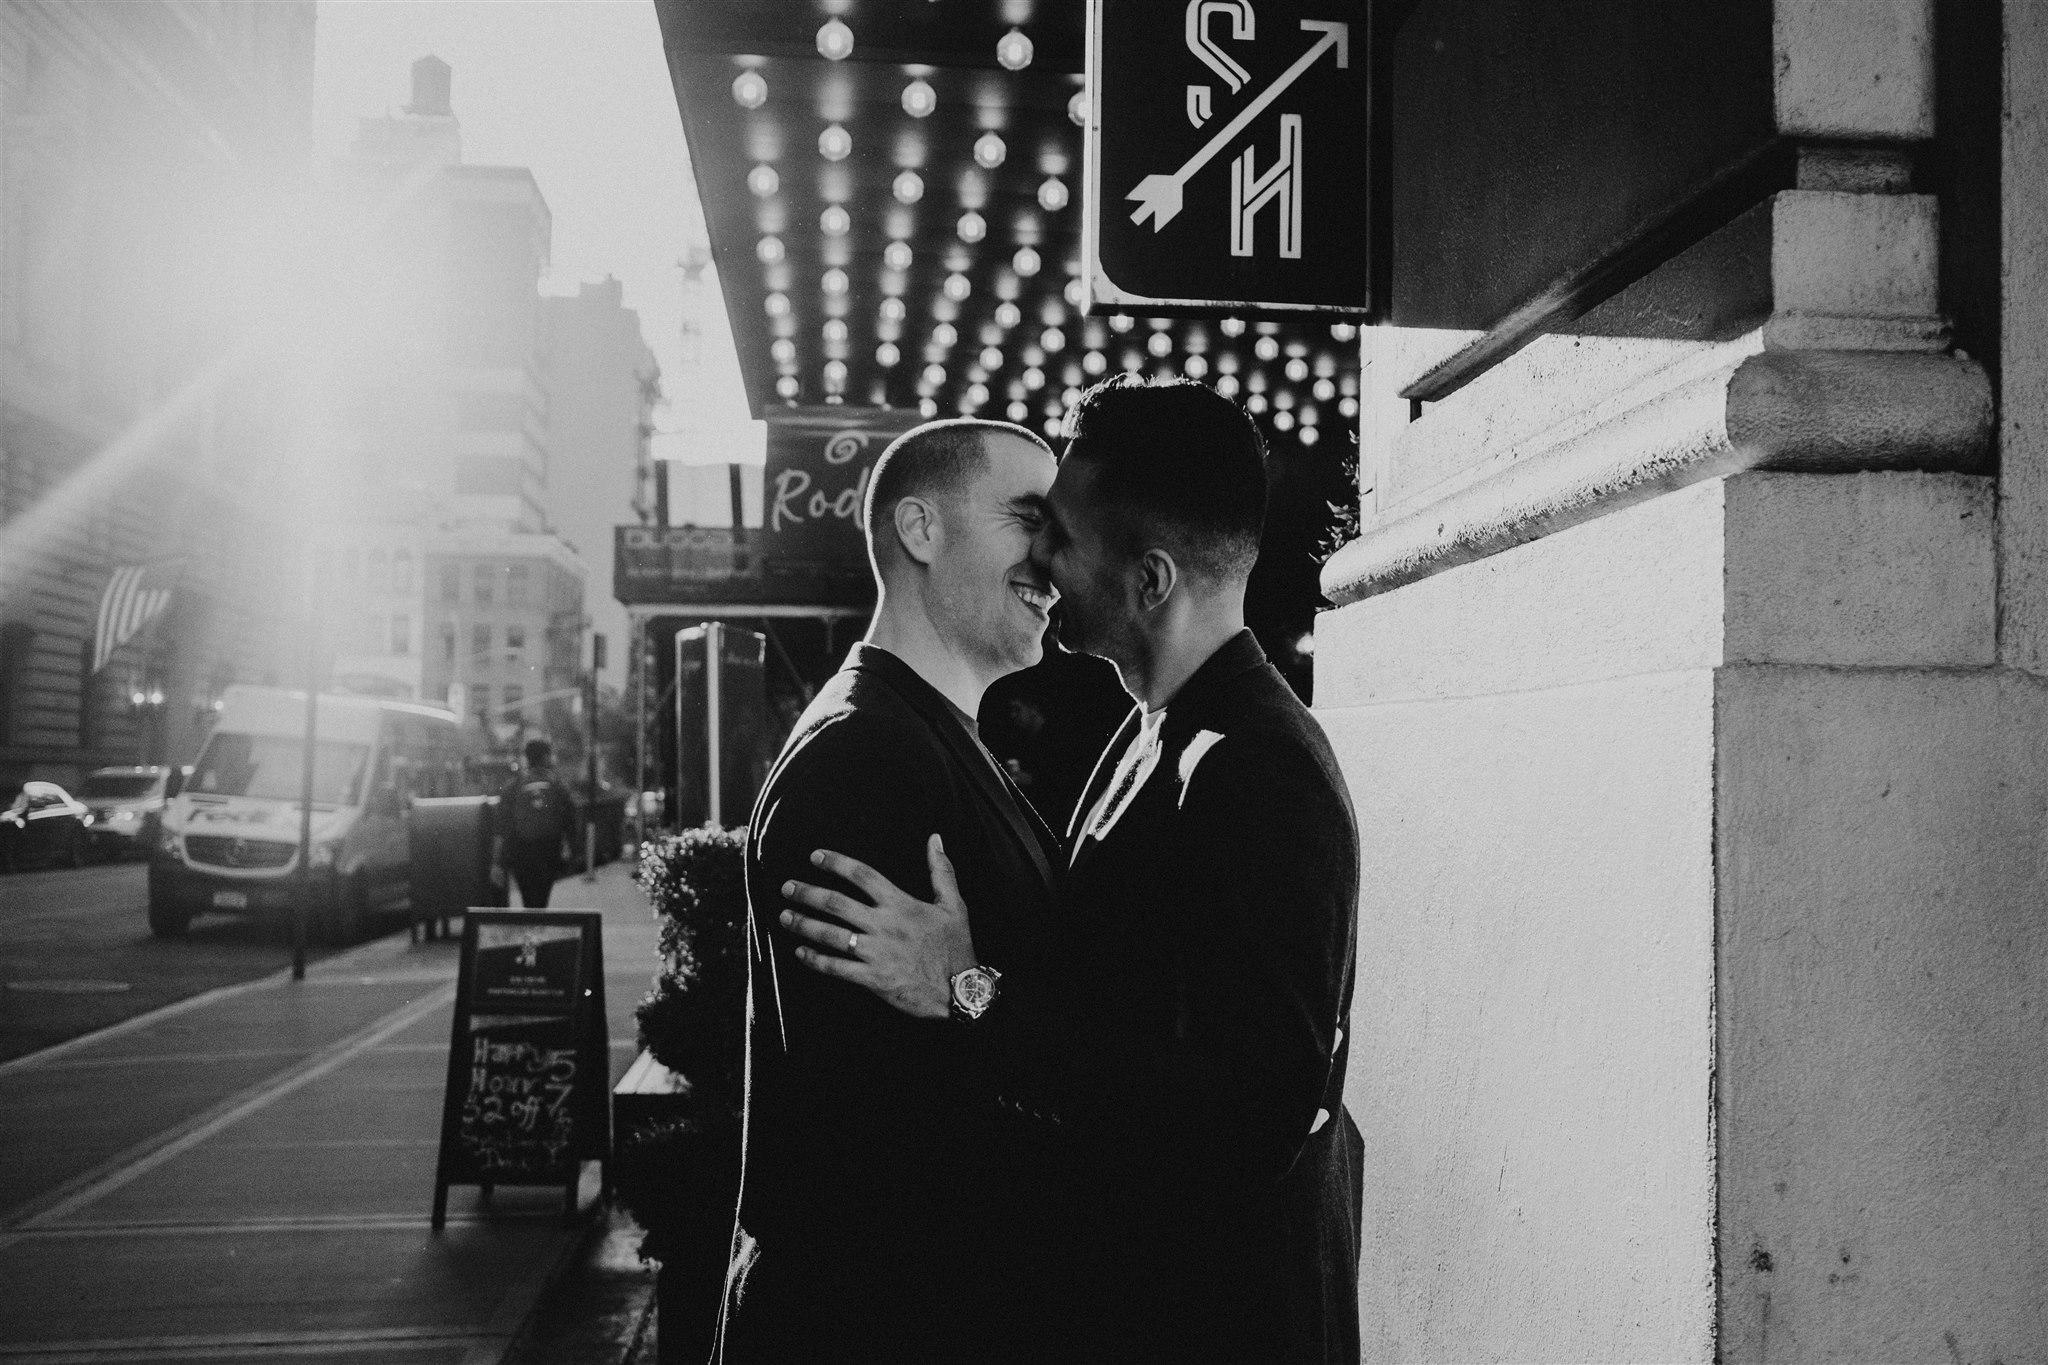 lbgtq-gay-wedding-elopement-photography-chellise-michael-photography286.JPG